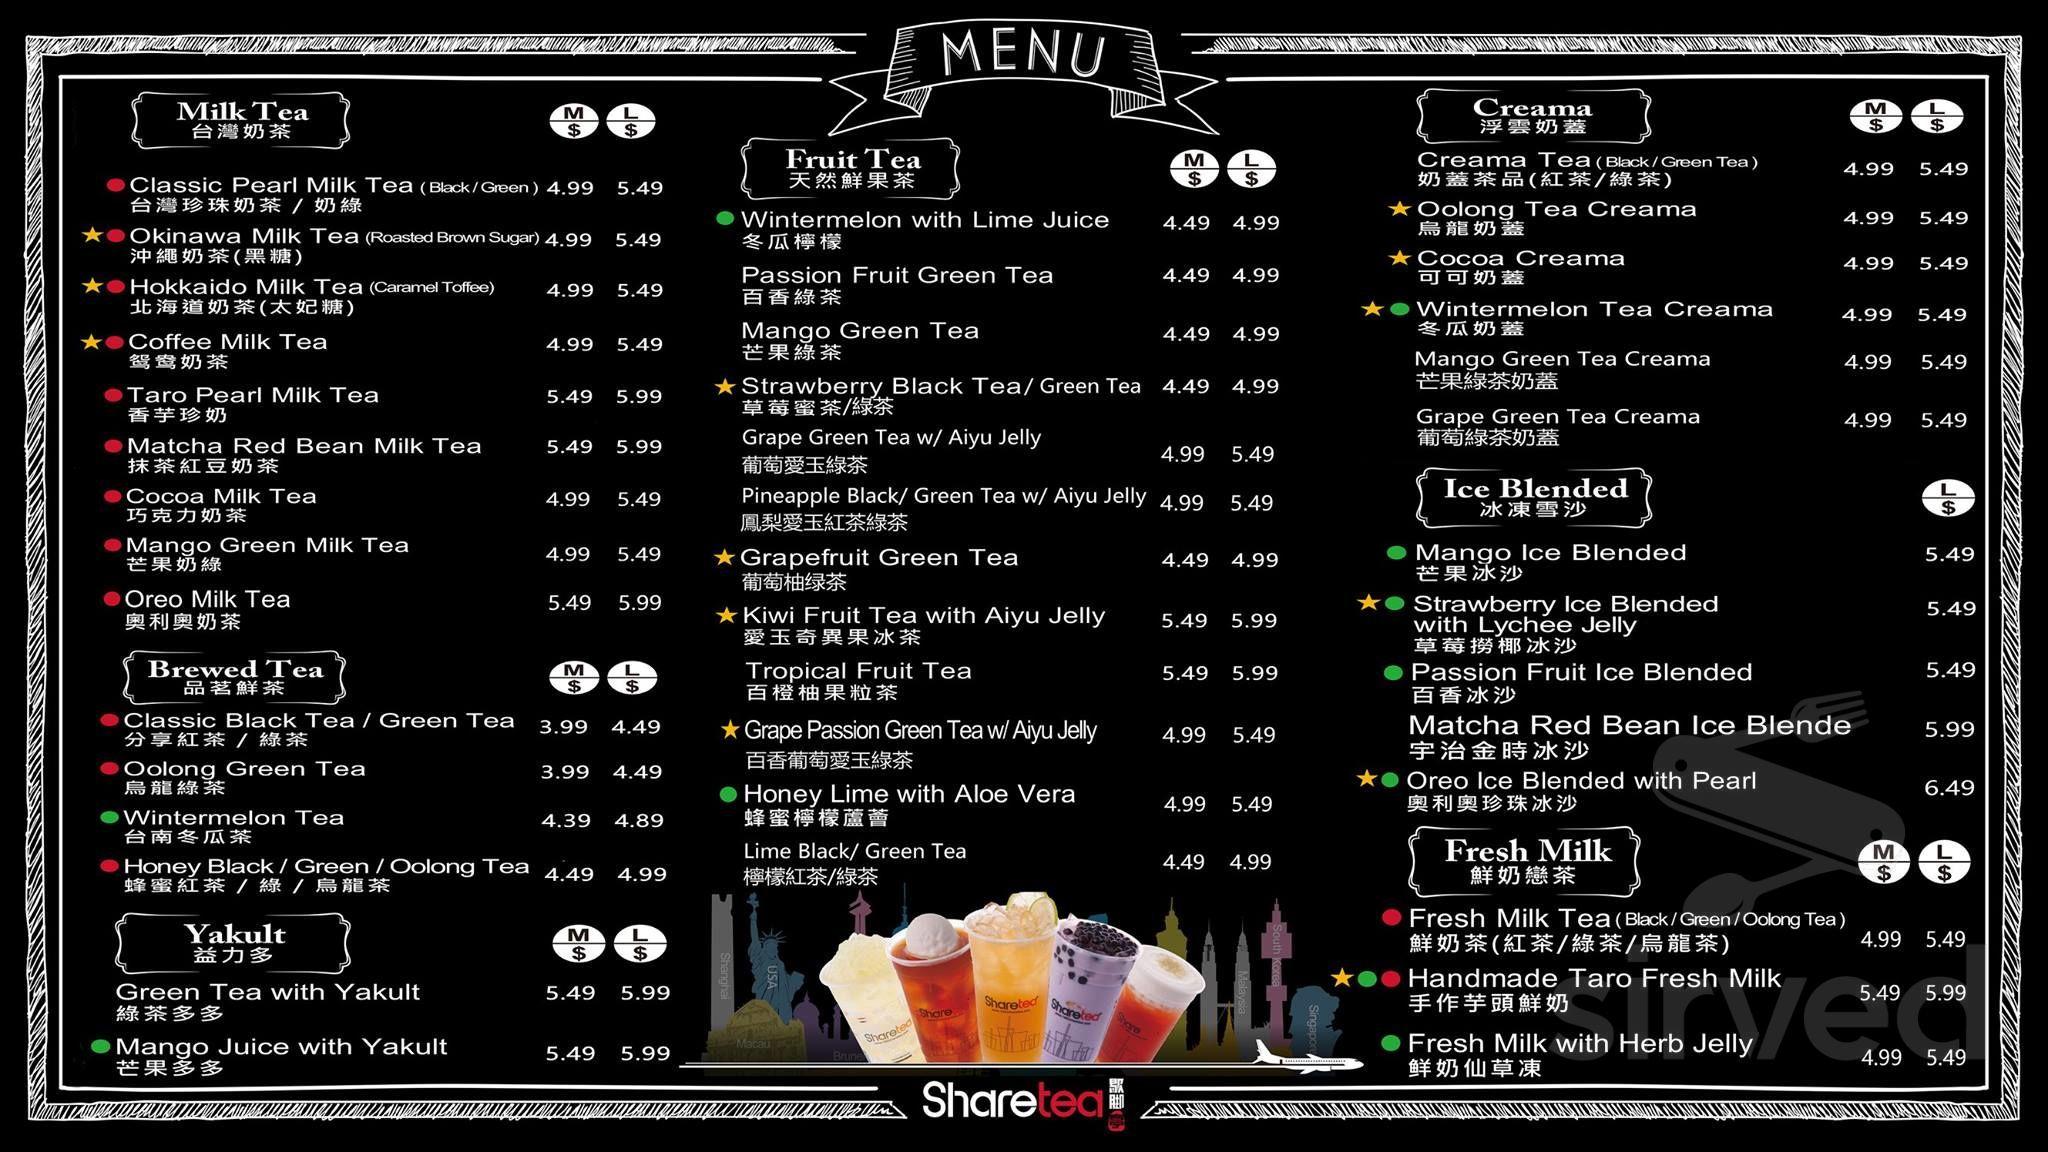 menu for sharetea windsor in windsor, ontario, canada